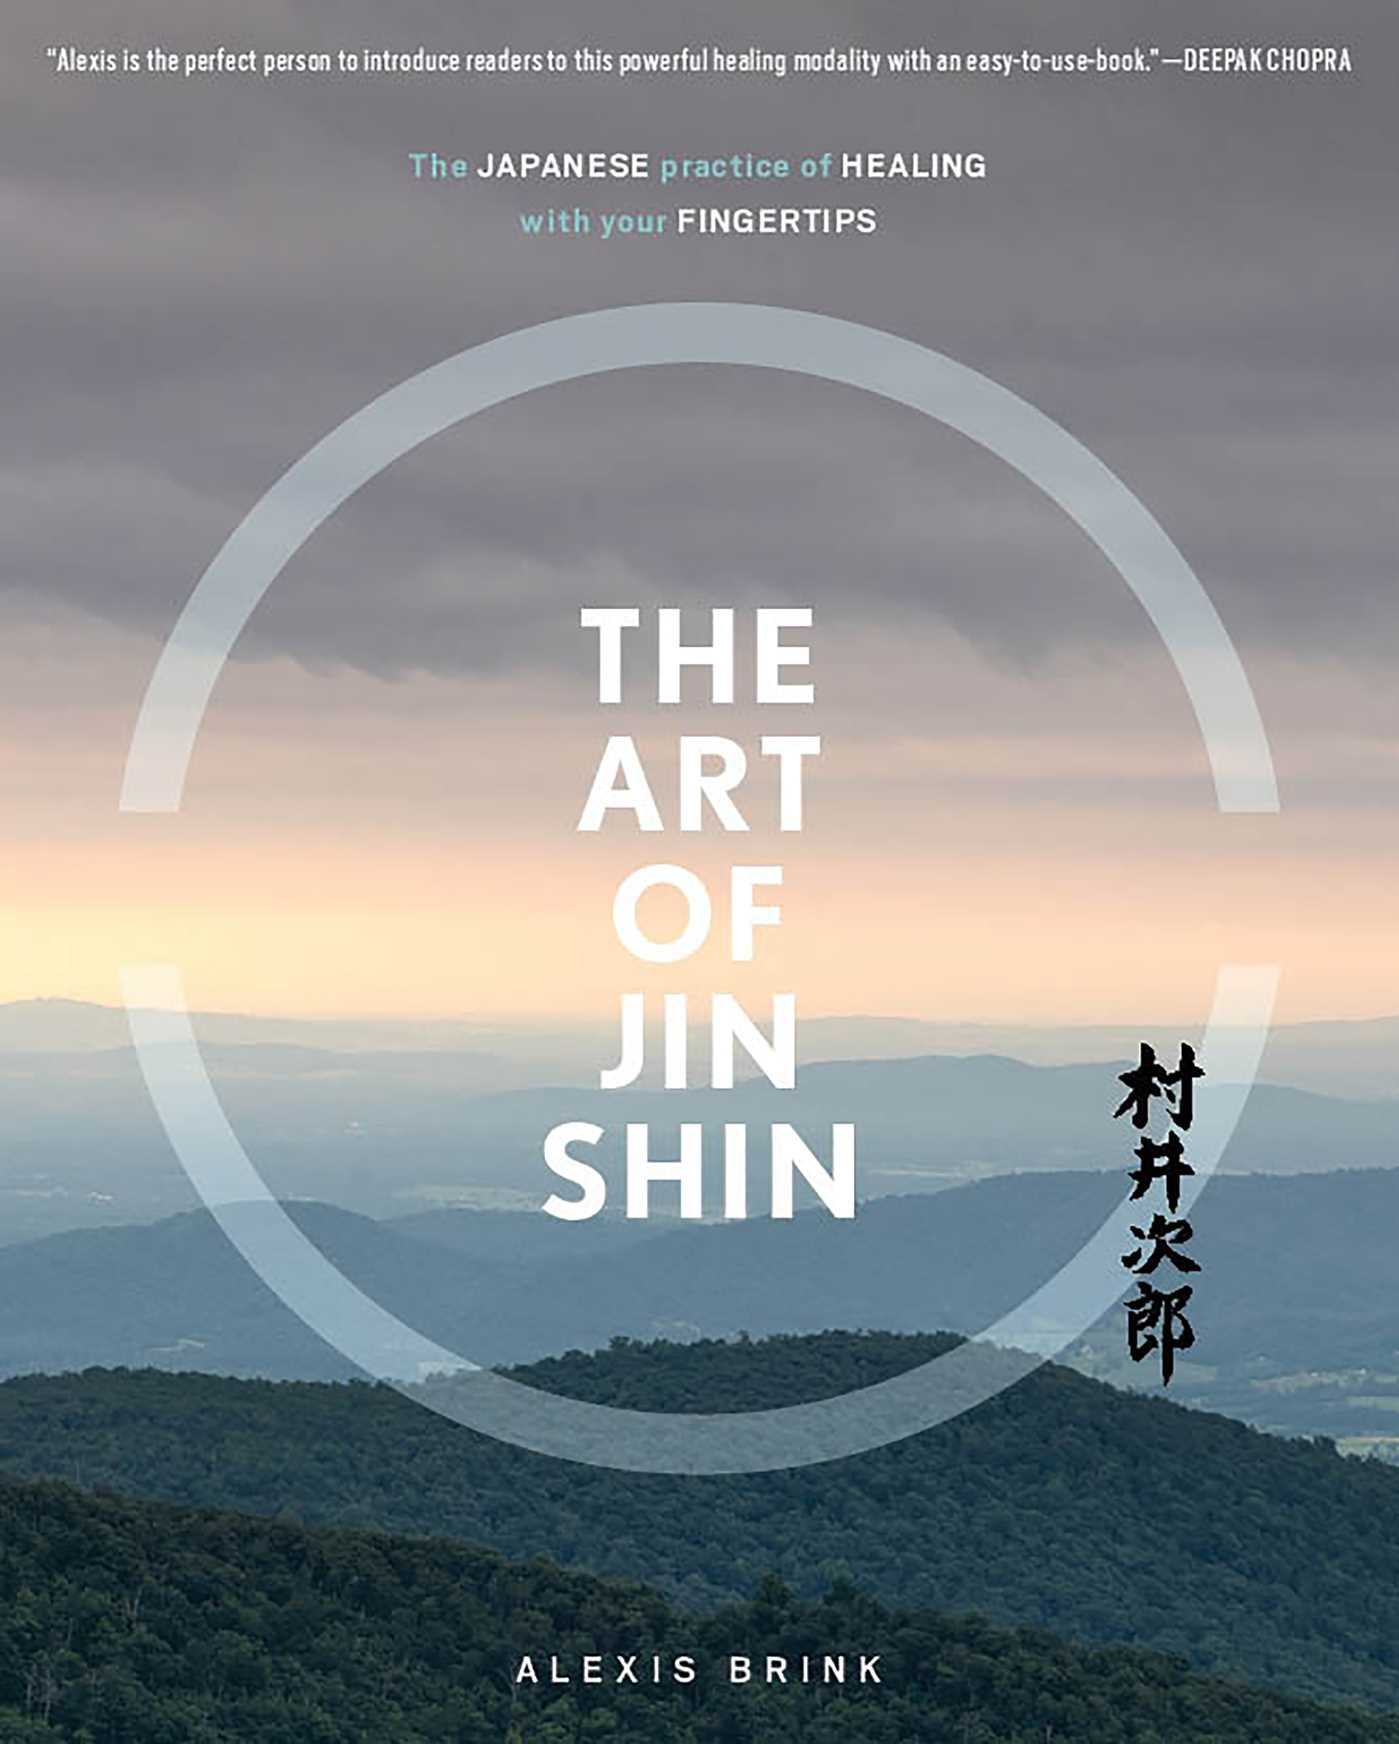 Art of Jin Shin_Book Cover.jpg